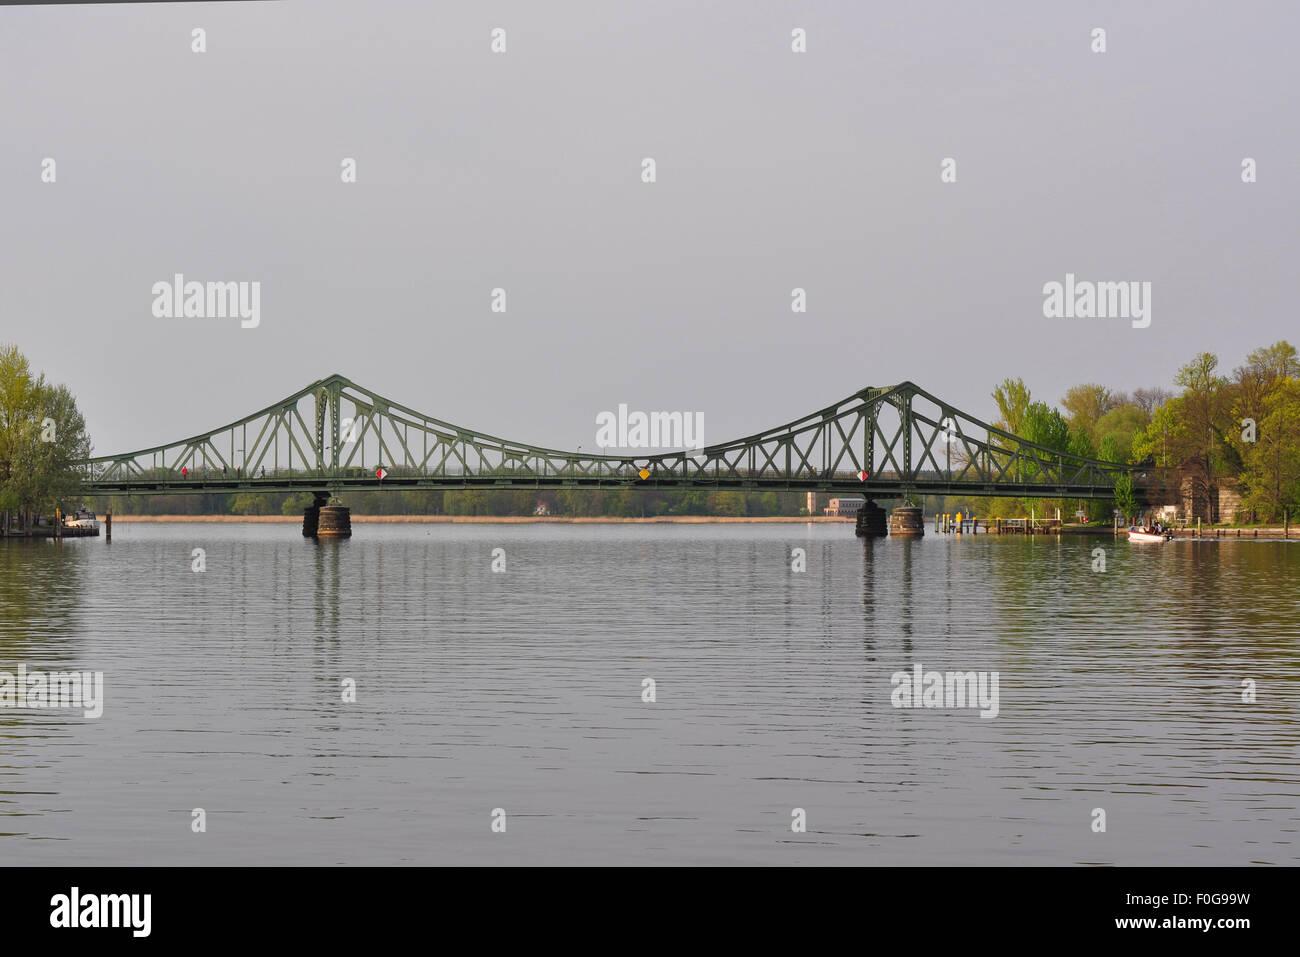 Glienicker Brücke, gesehen vom Schloßpark Babelsbnerg / seen from park of Babelsberg castle, Potsdam, - Stock Image